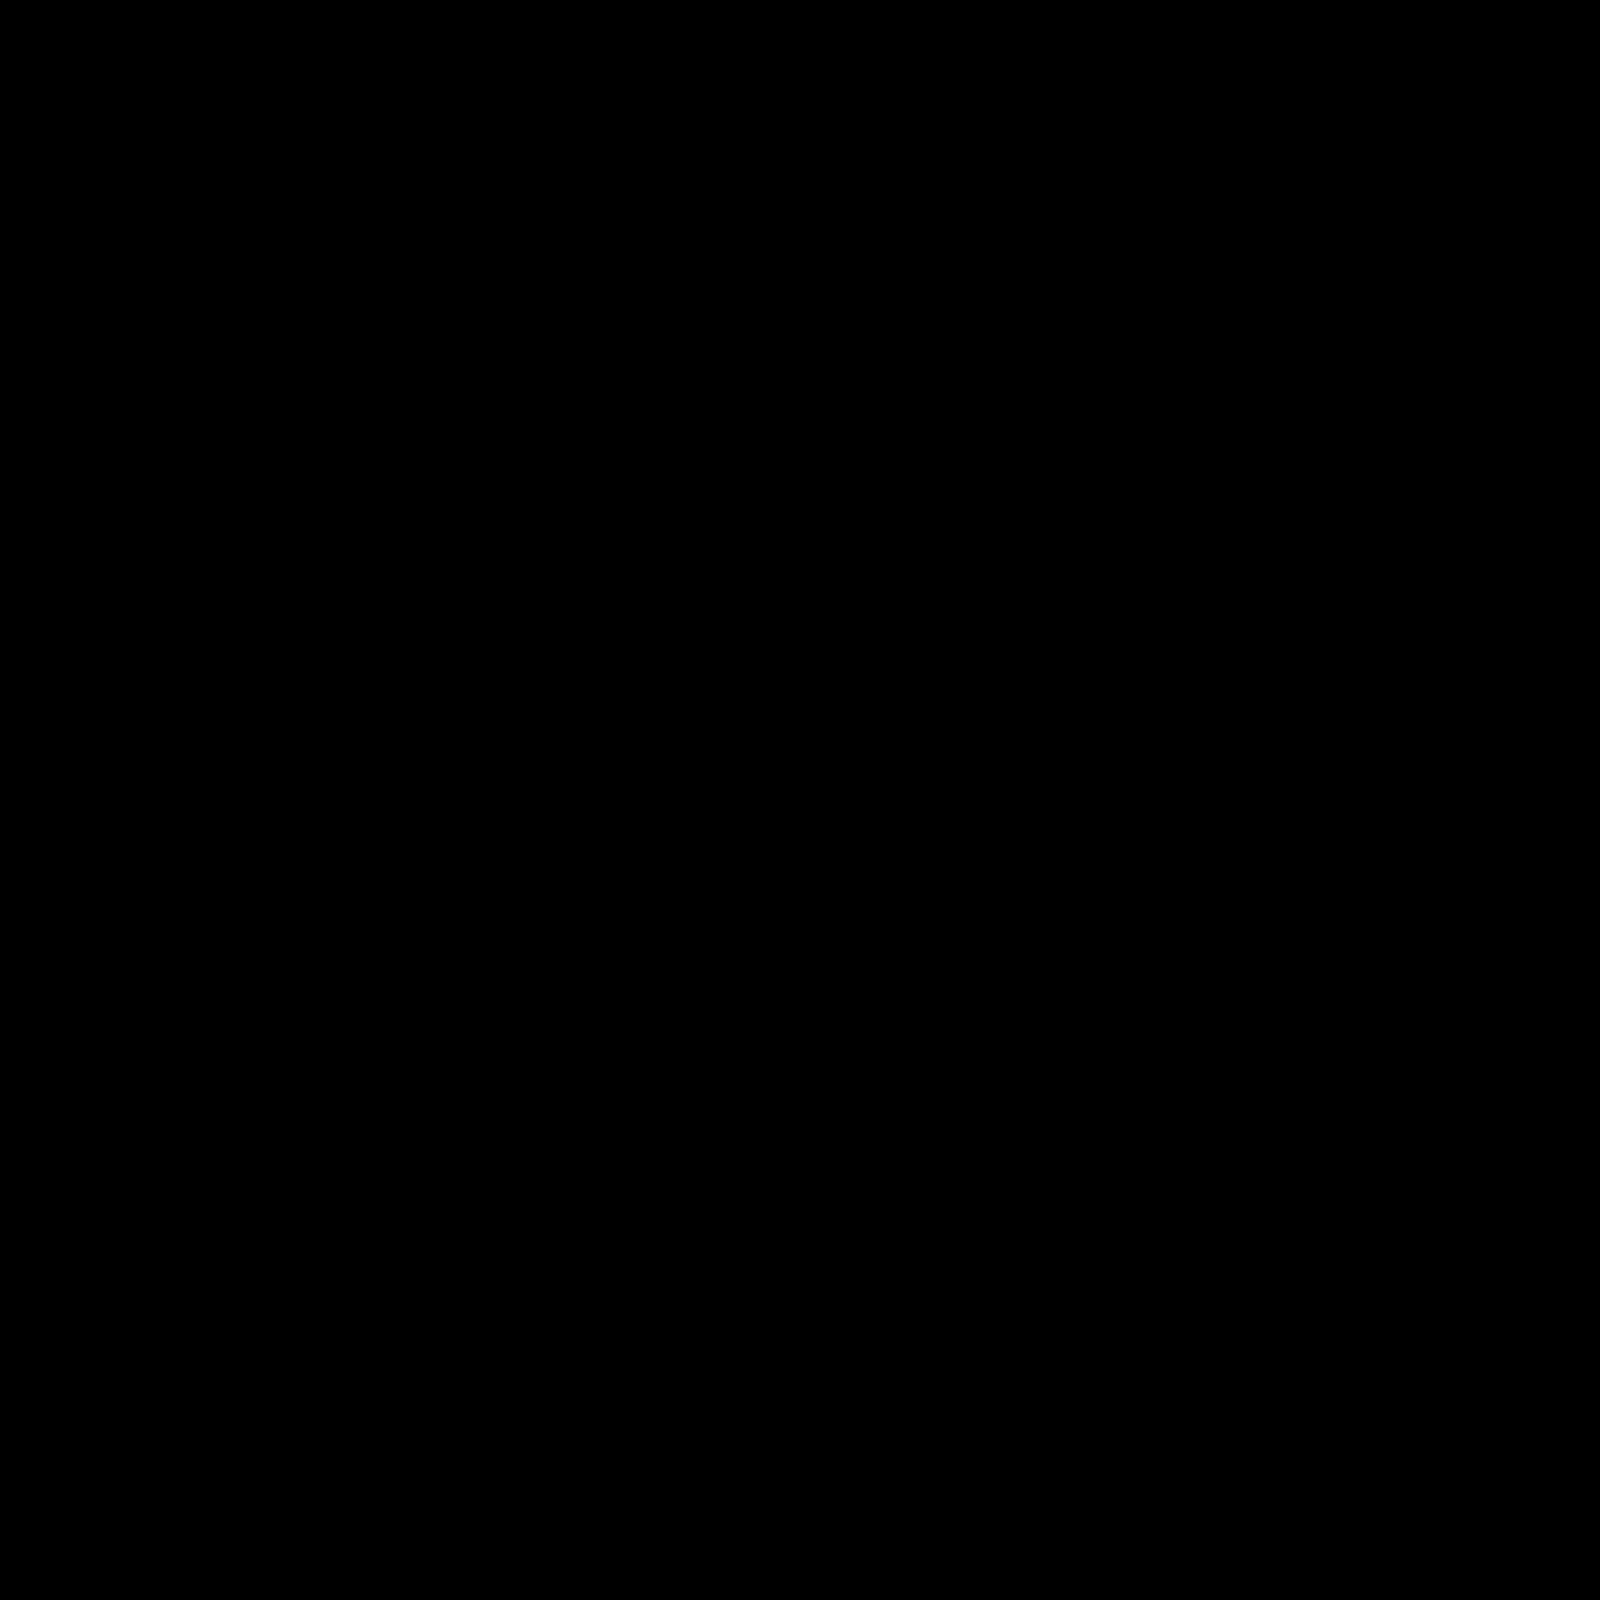 Bumpy Road Sign icon